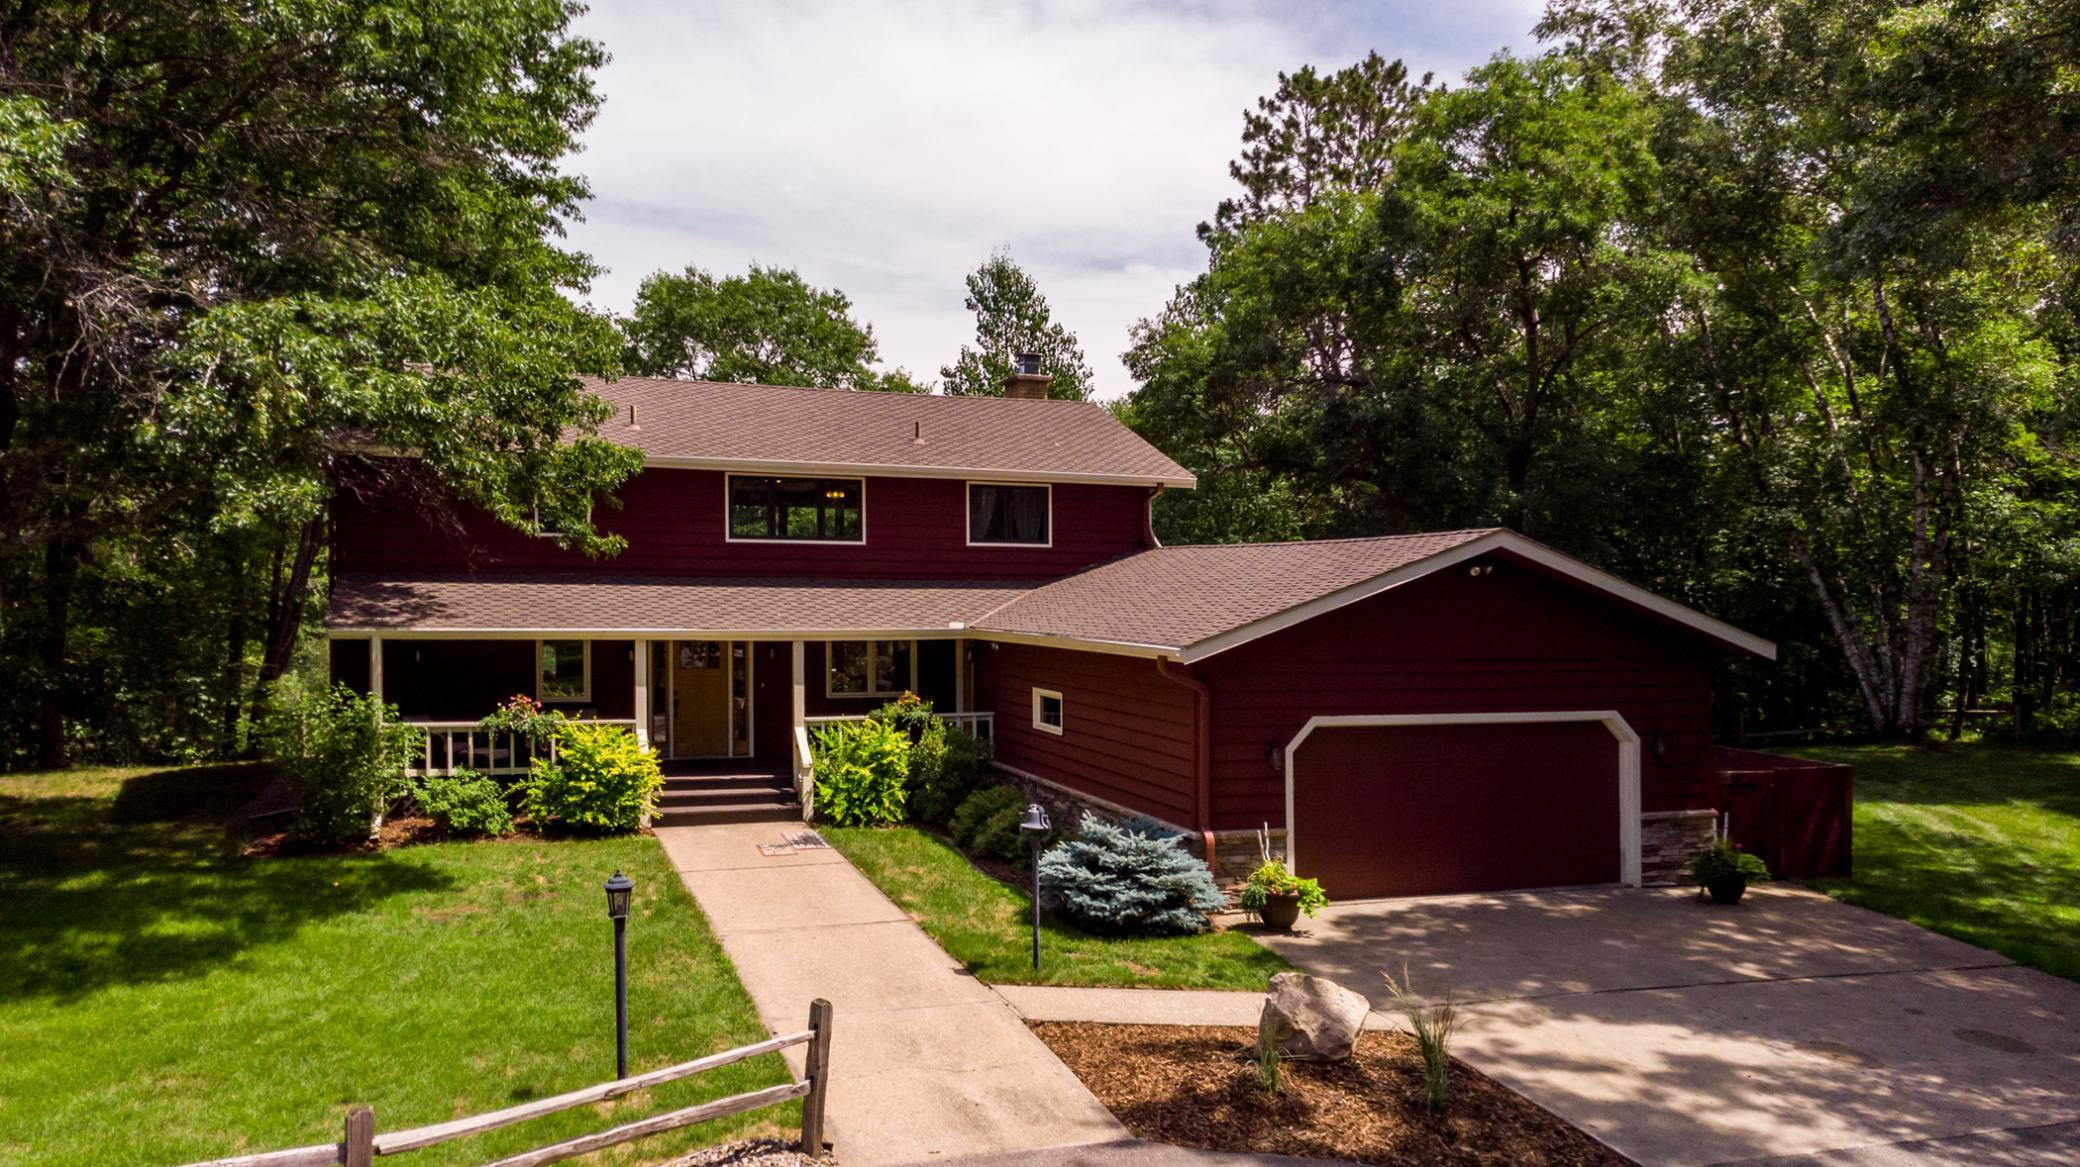 3810 Gull River Property Photo - East Gull Lake, MN real estate listing